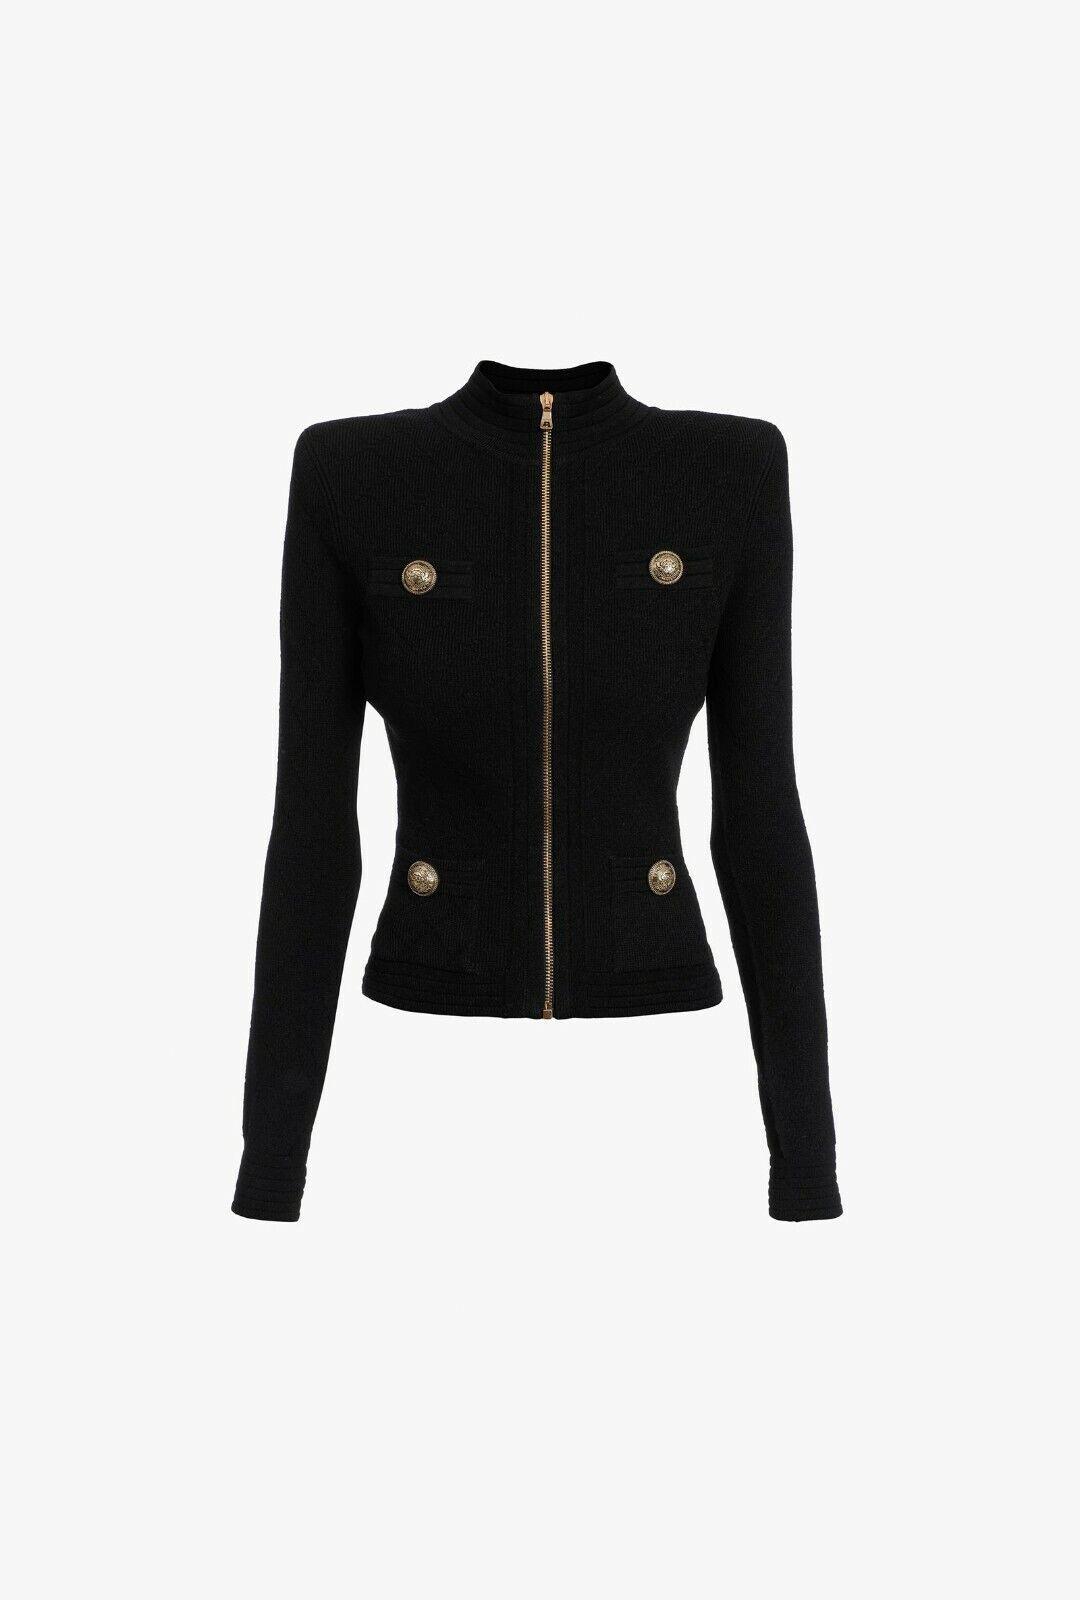 BALMAIN 1750 Short Black Knit Jacket With Zip Fastening